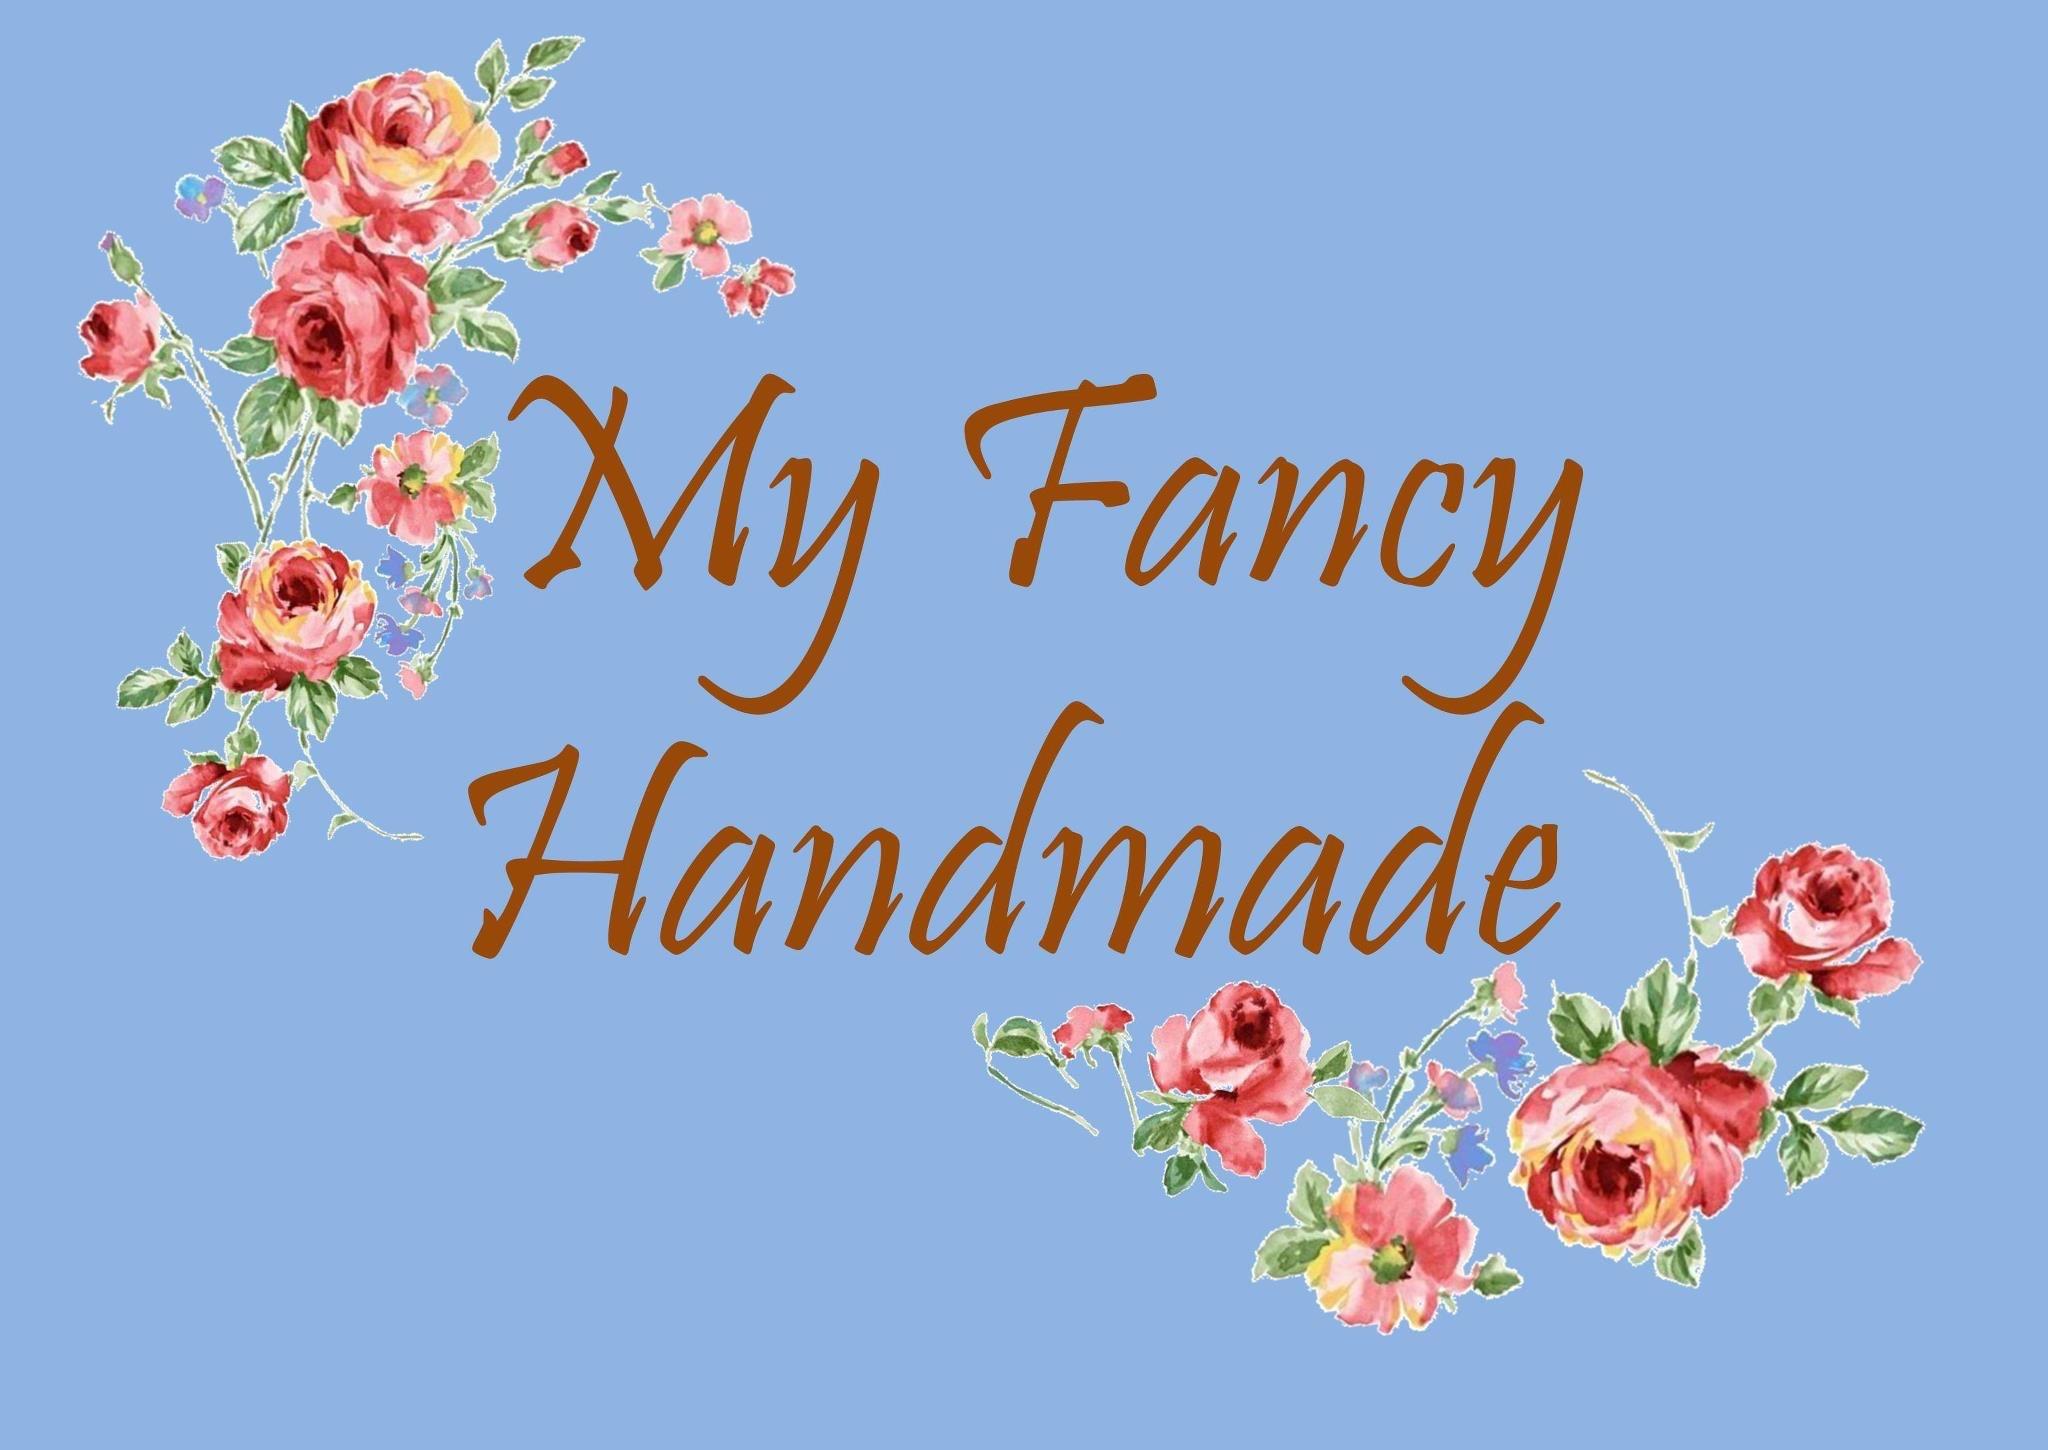 Fancy Handmade_12.jpg